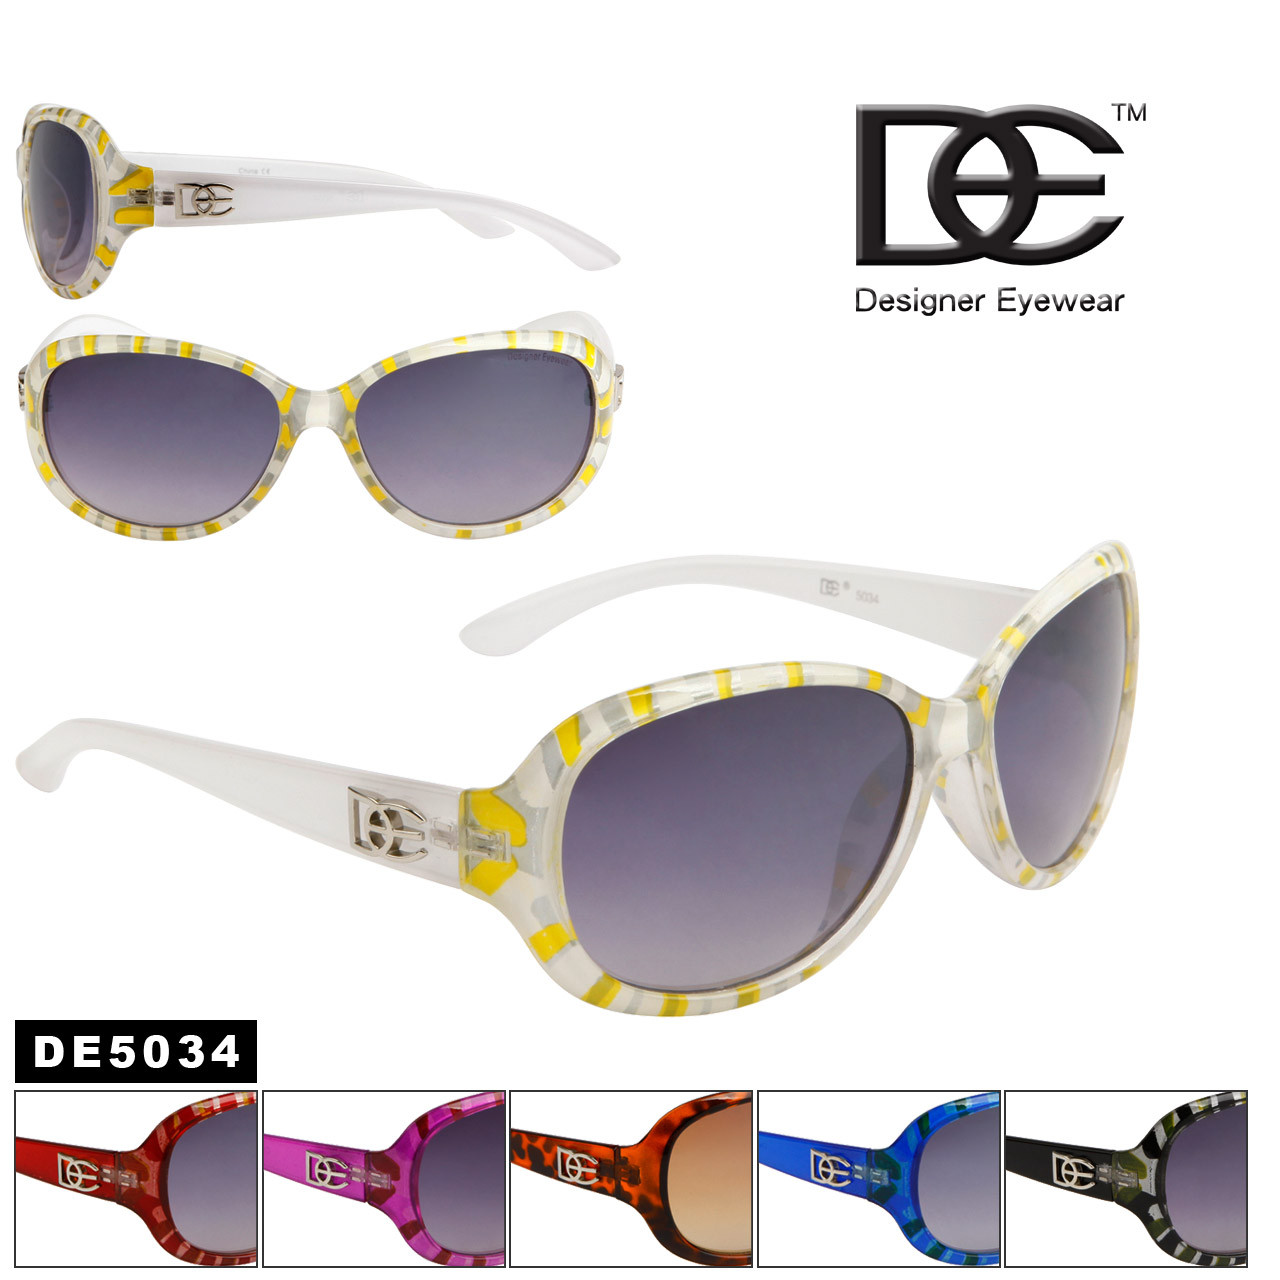 759ed967c Wholesale DE™ Designer Sunglasses - Style #DE5034